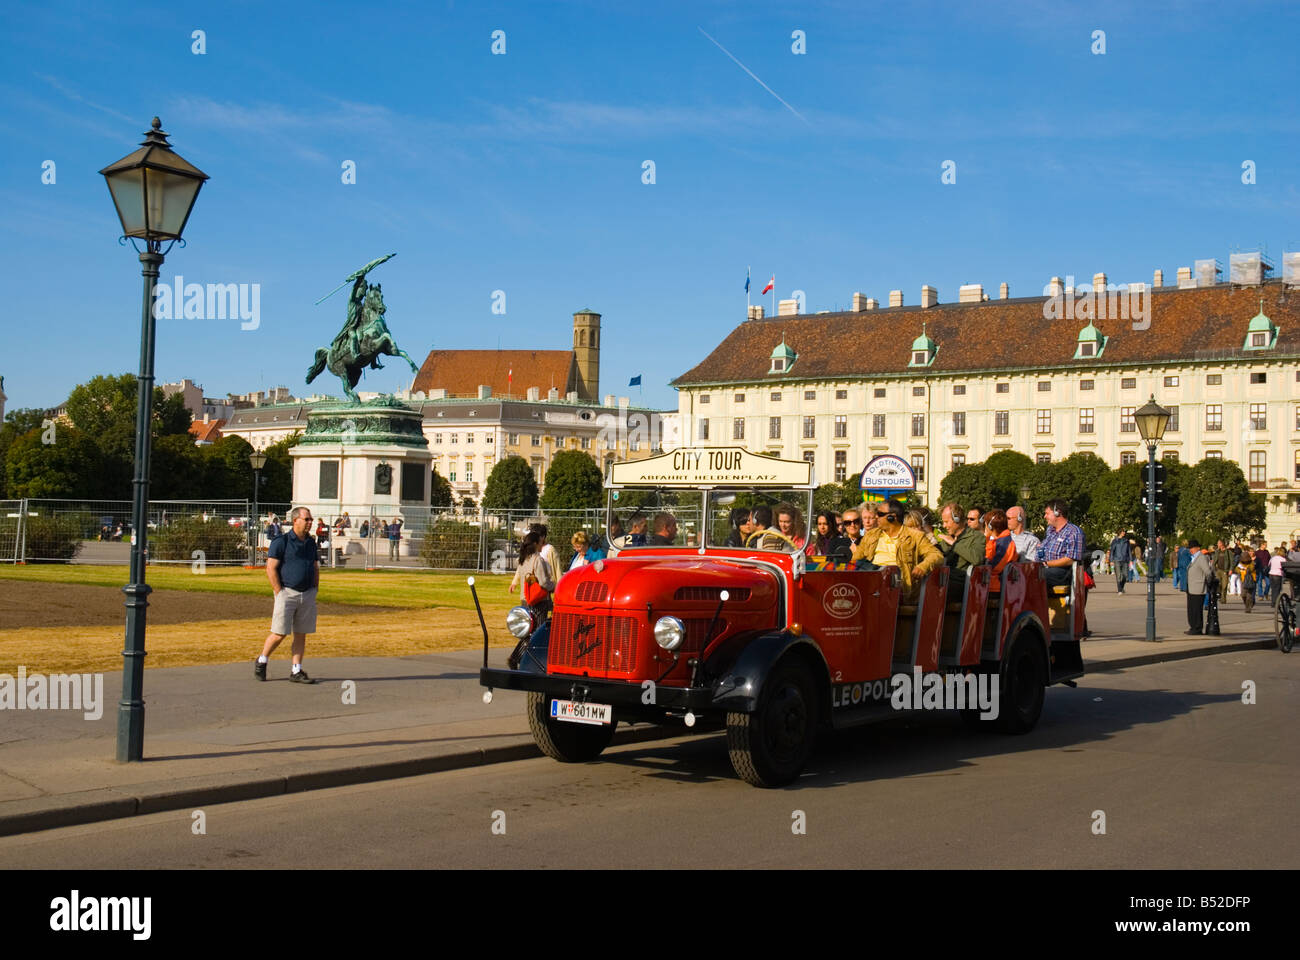 Tourists at Heldenplatz square in central Vienna Austria Europe - Stock Image